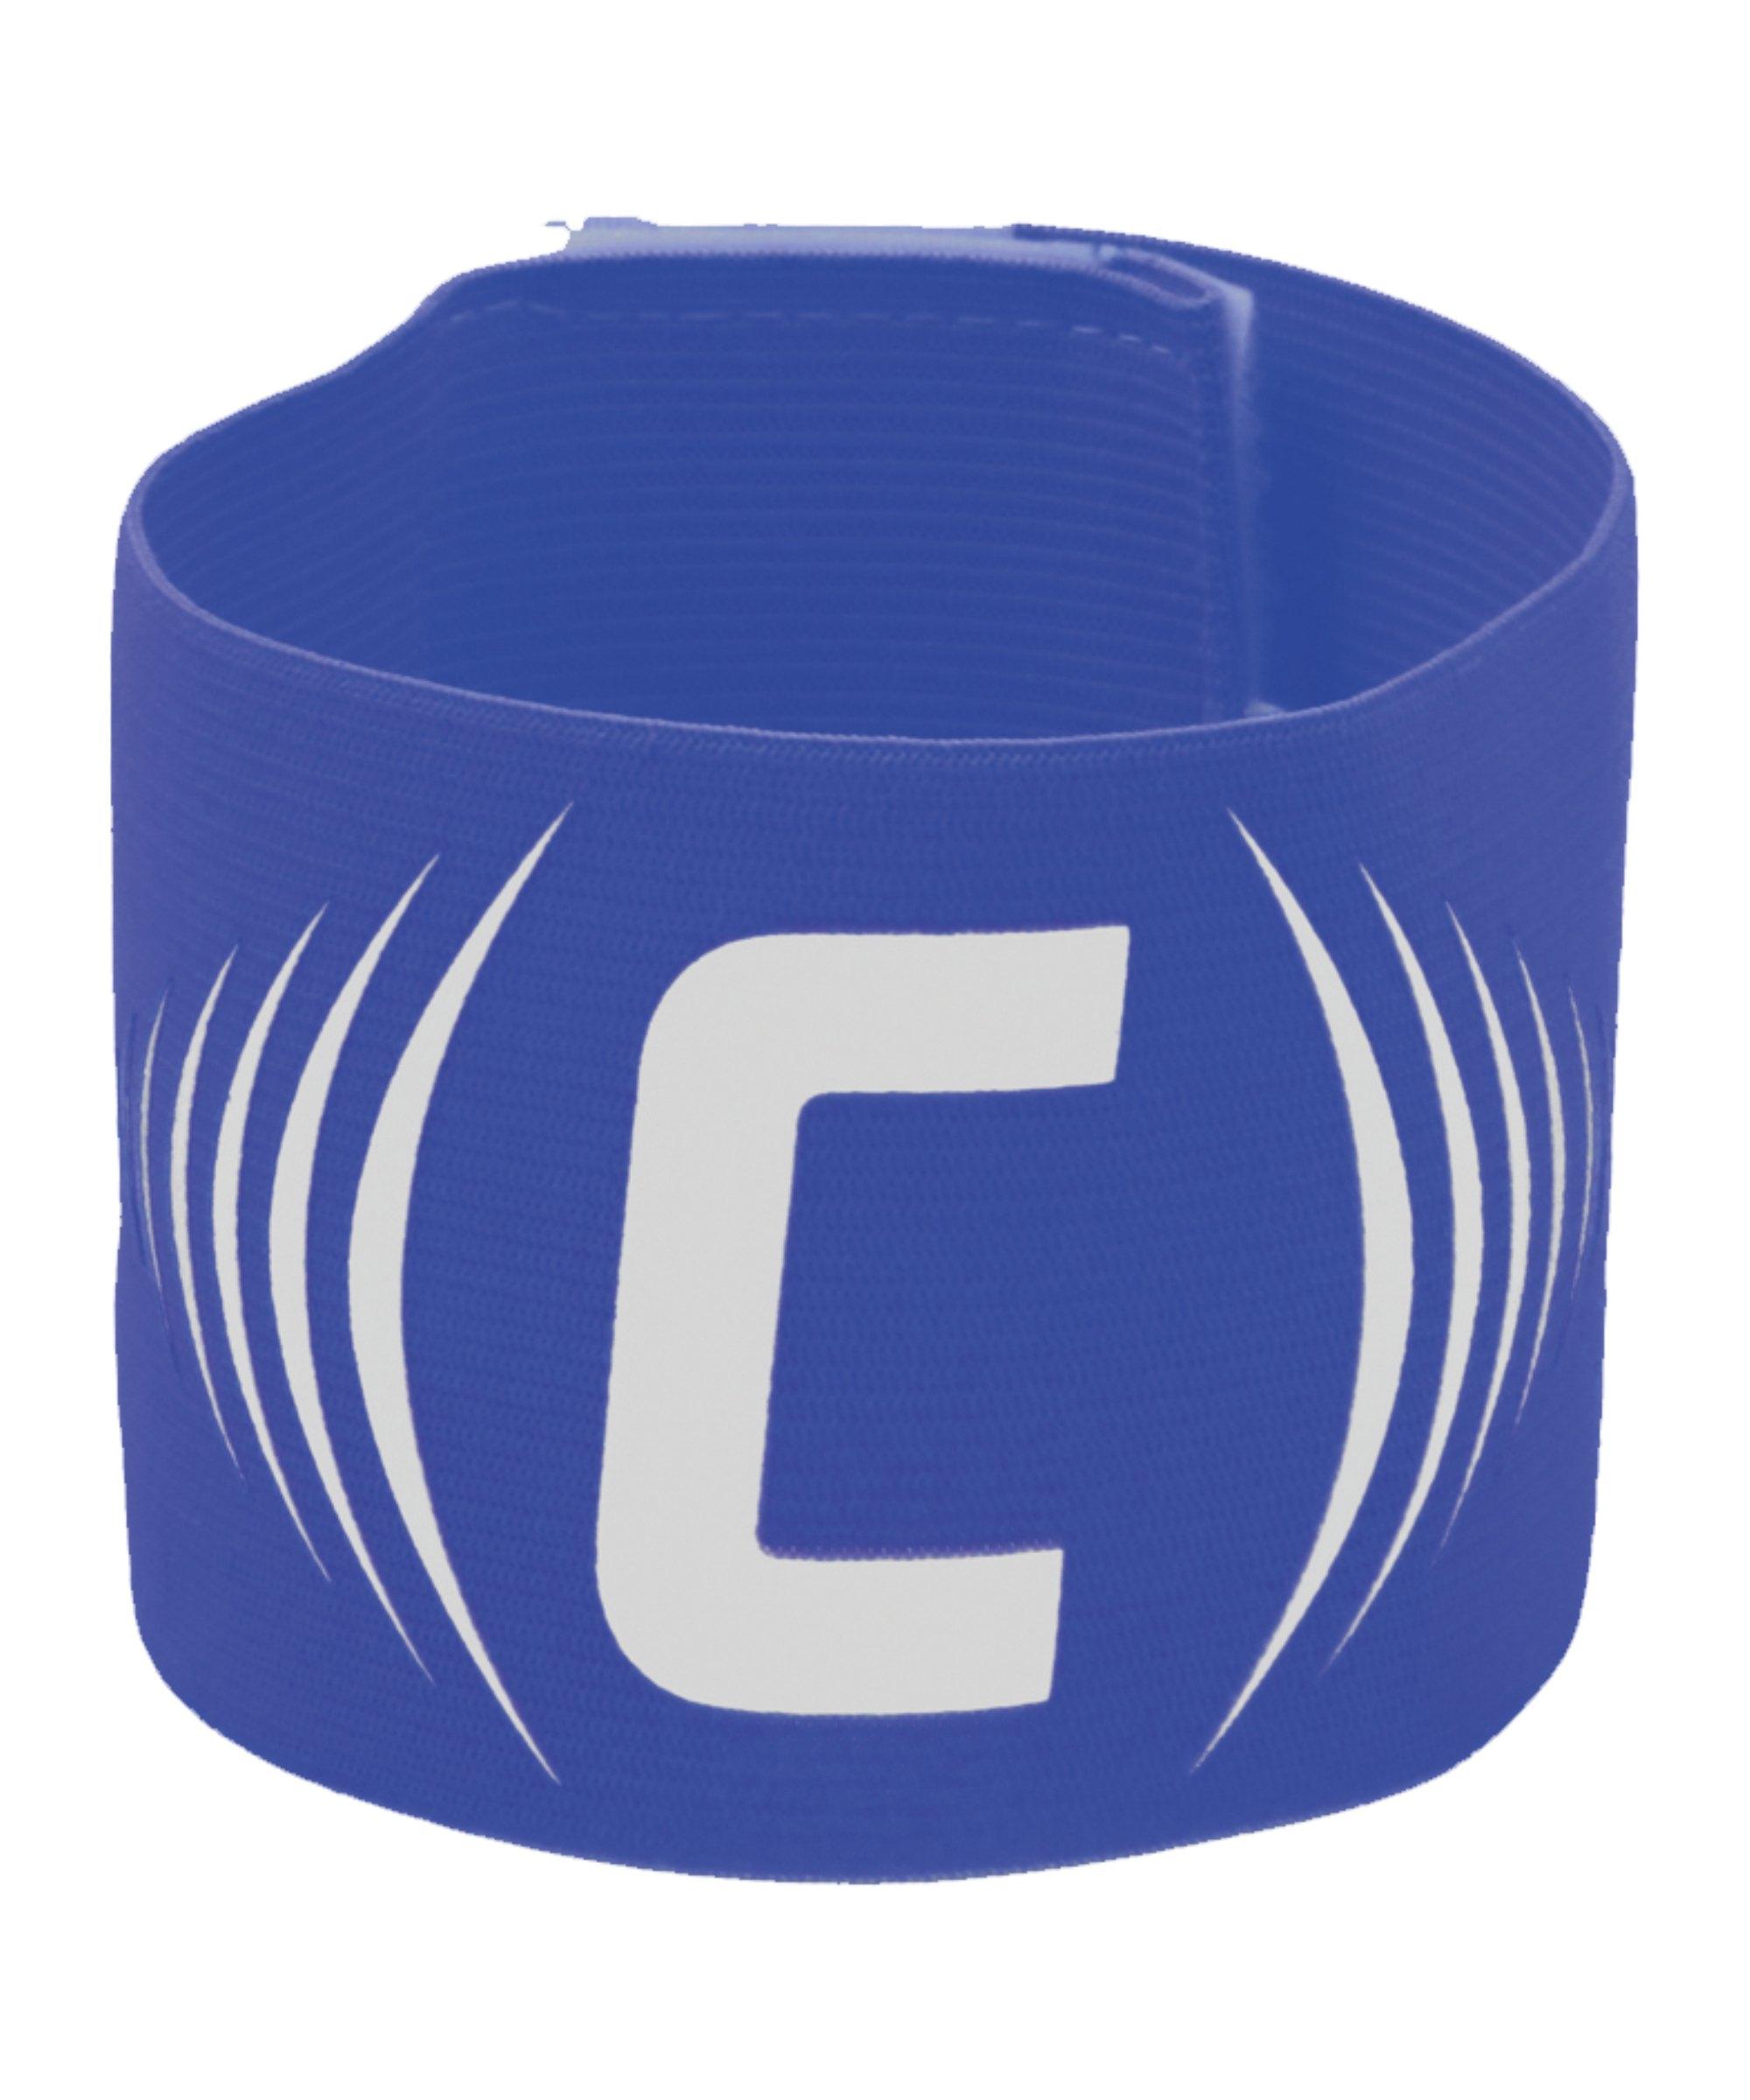 Cawila Armbinde C Klett Blau - blau